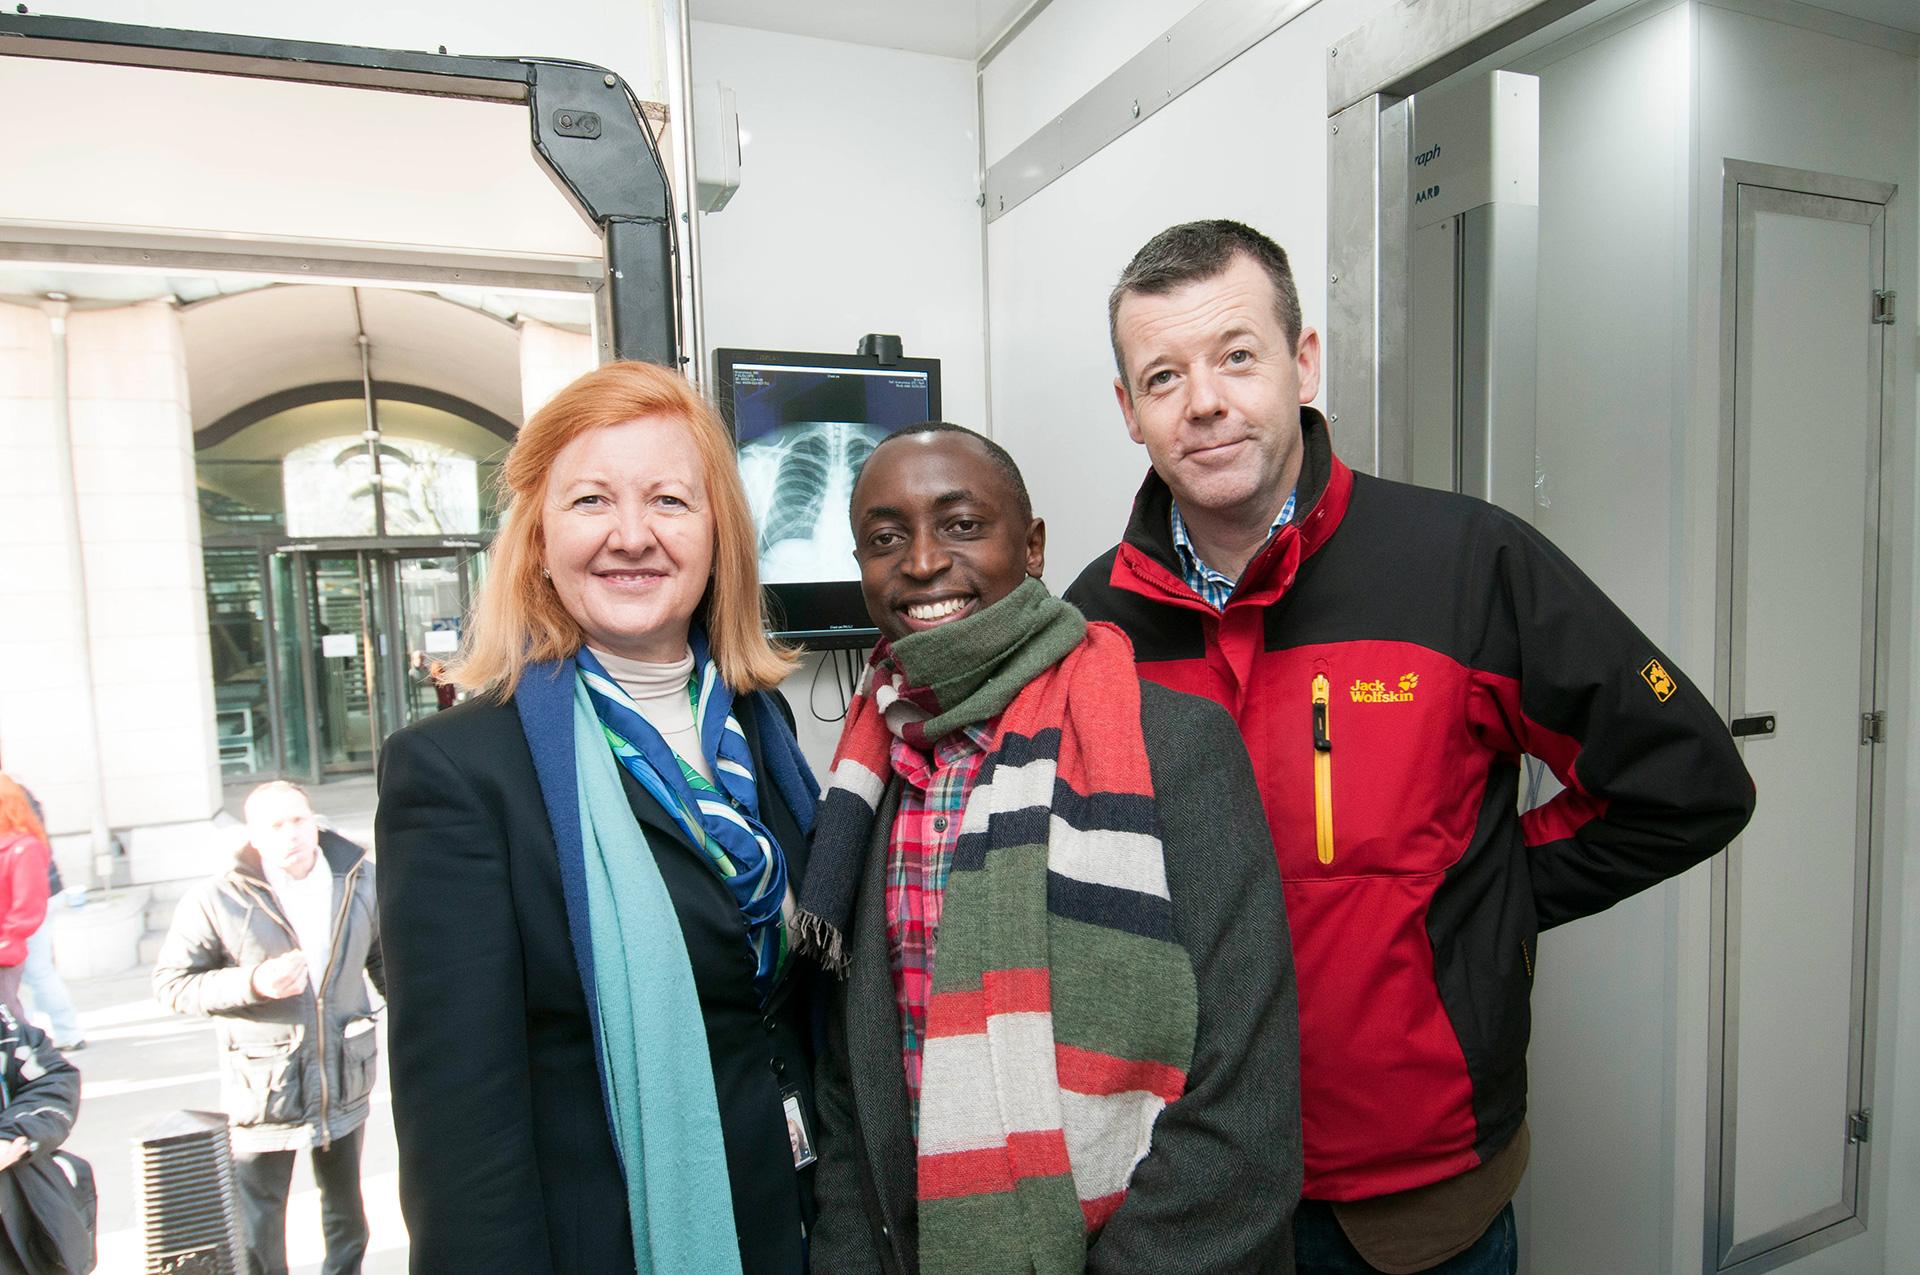 UCLH-TB-bus-initiative-launch-at-Portcullis-House-008_Adam-Scott